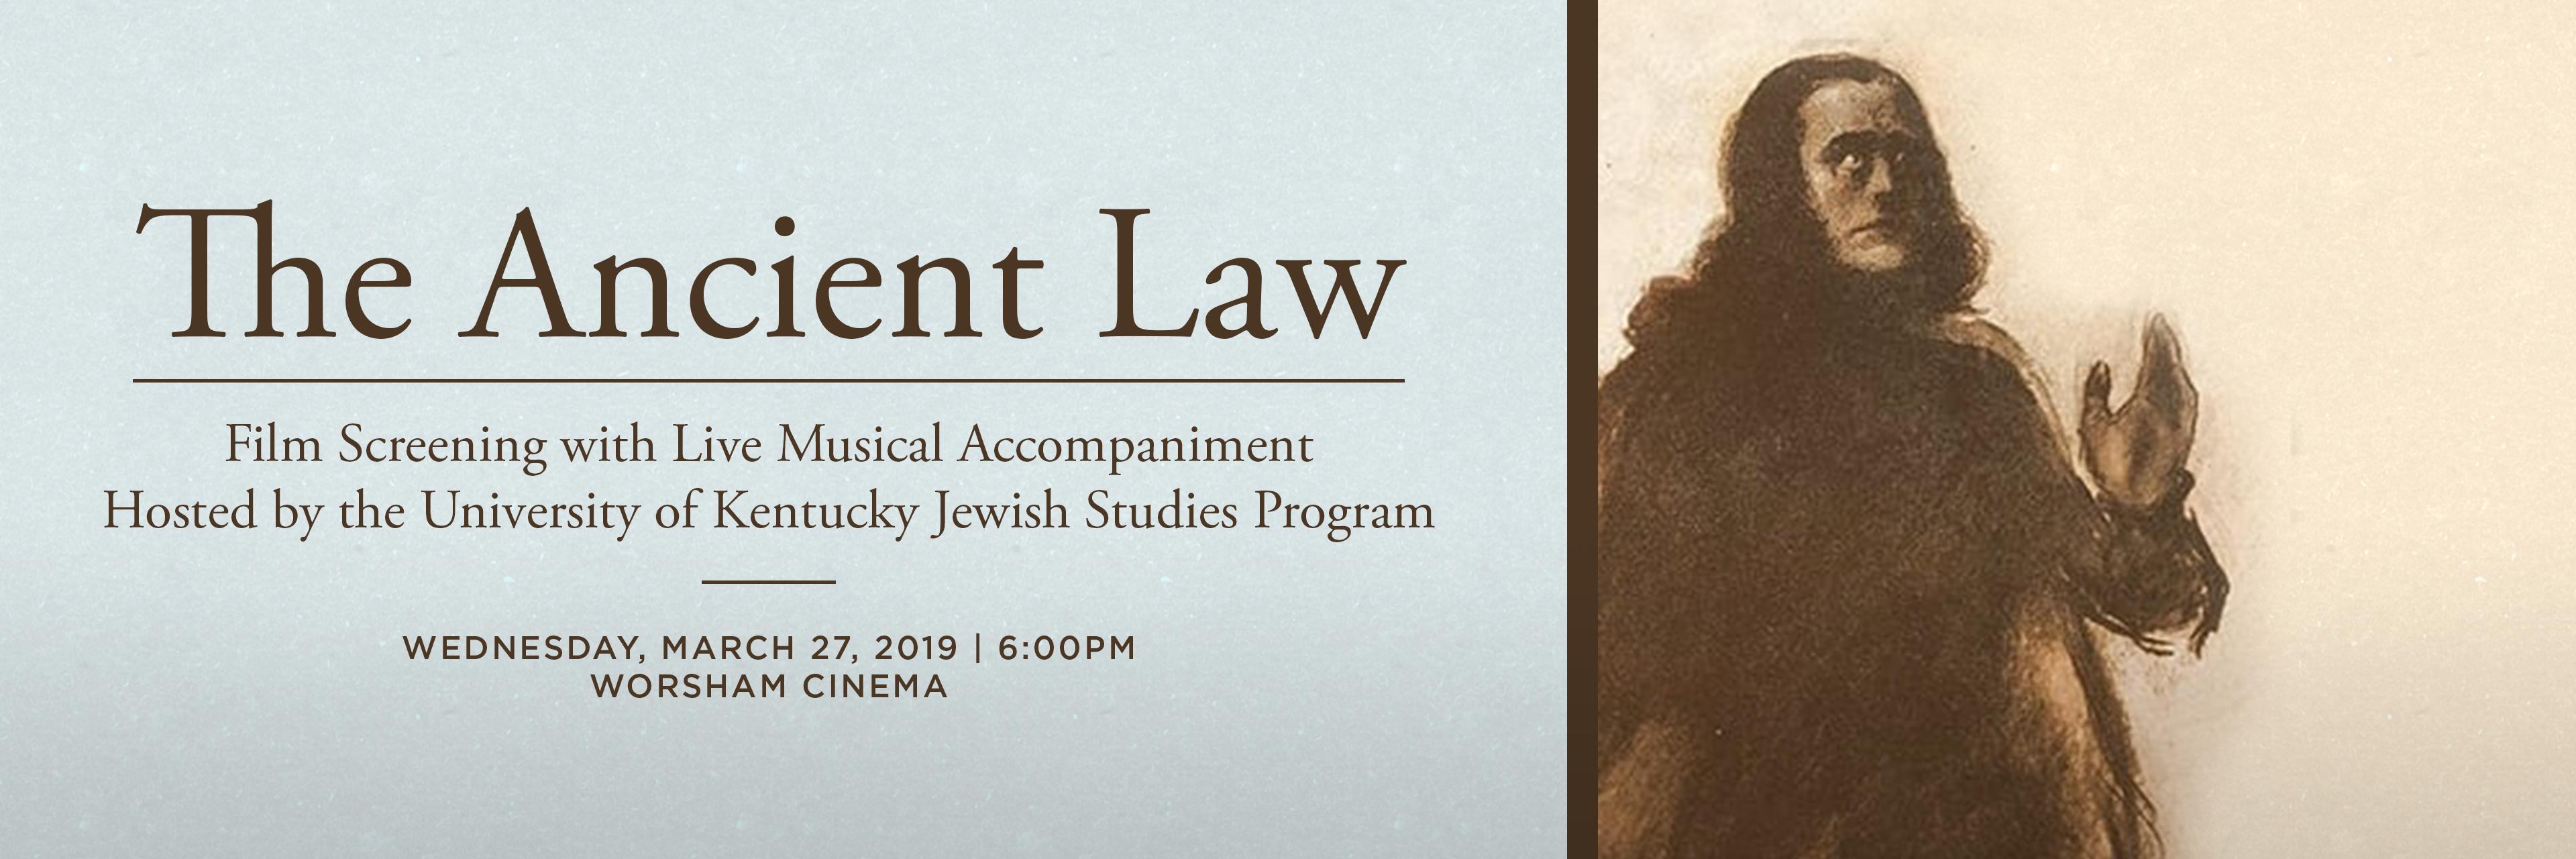 Cine-Concert: The Ancient Law   Jewish Studies